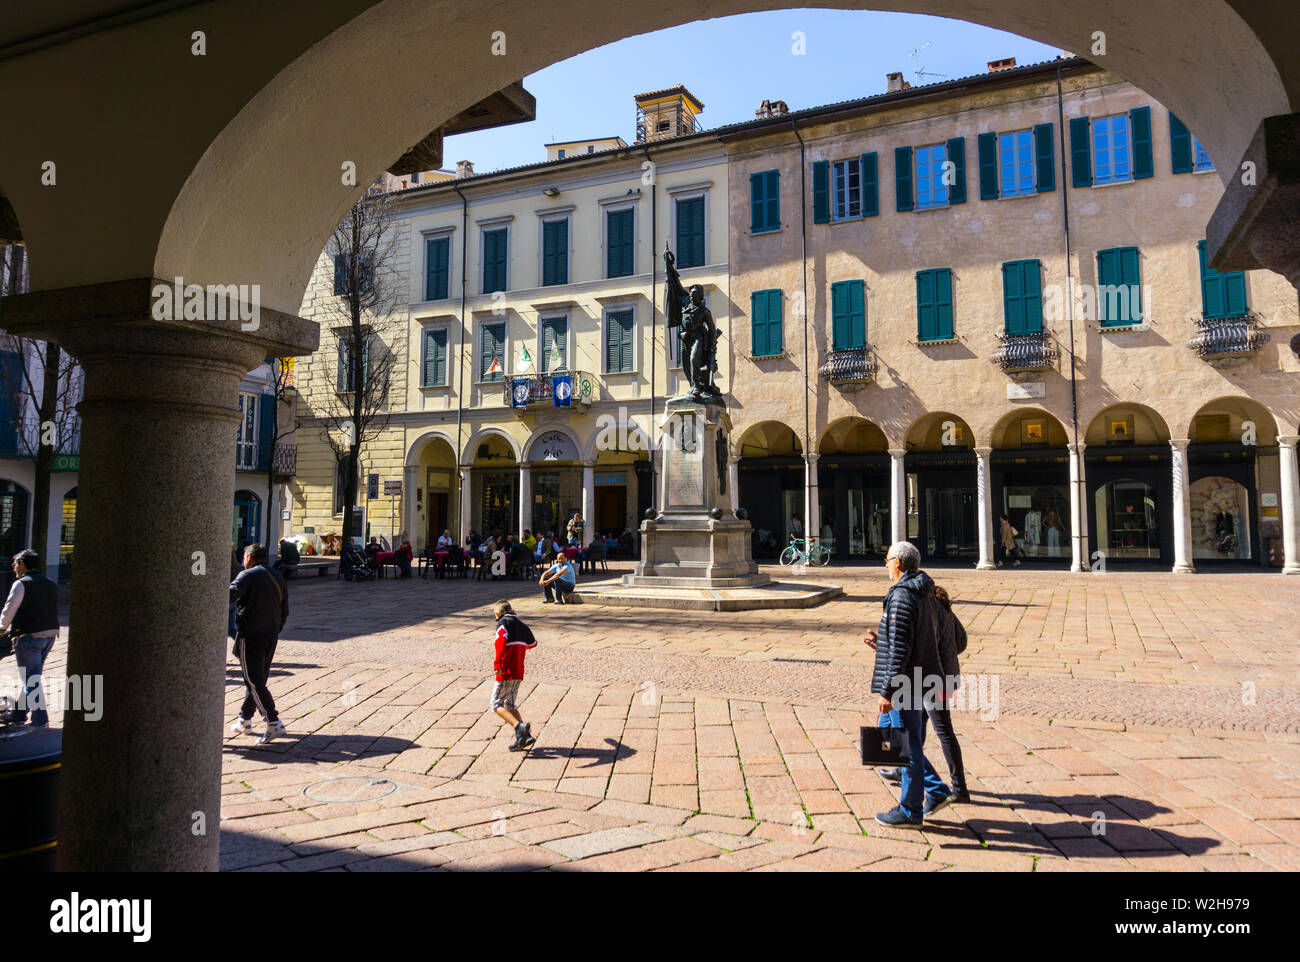 Italy, Lombardy, Varese, Piazza del Podestà Stock Photo